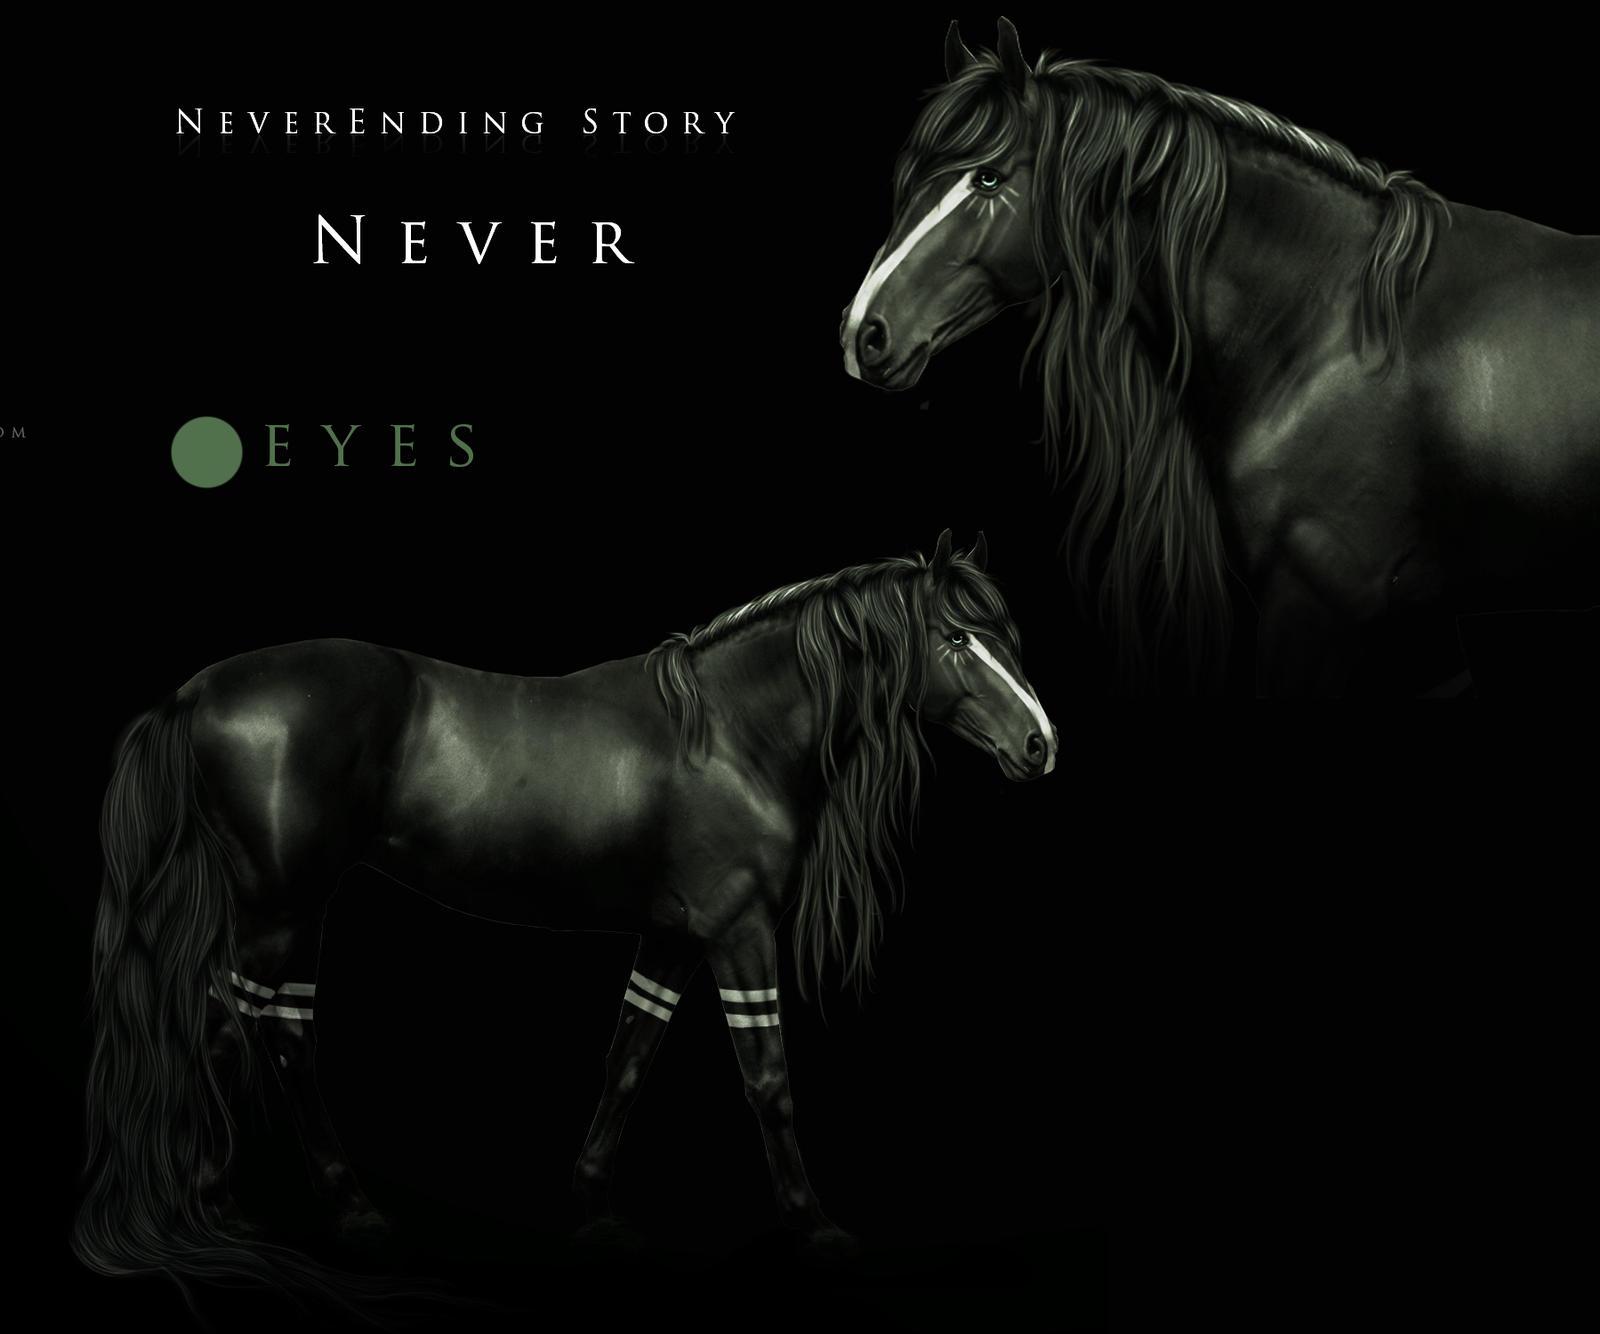 Neverending Story Ref by BlueHorseStudios